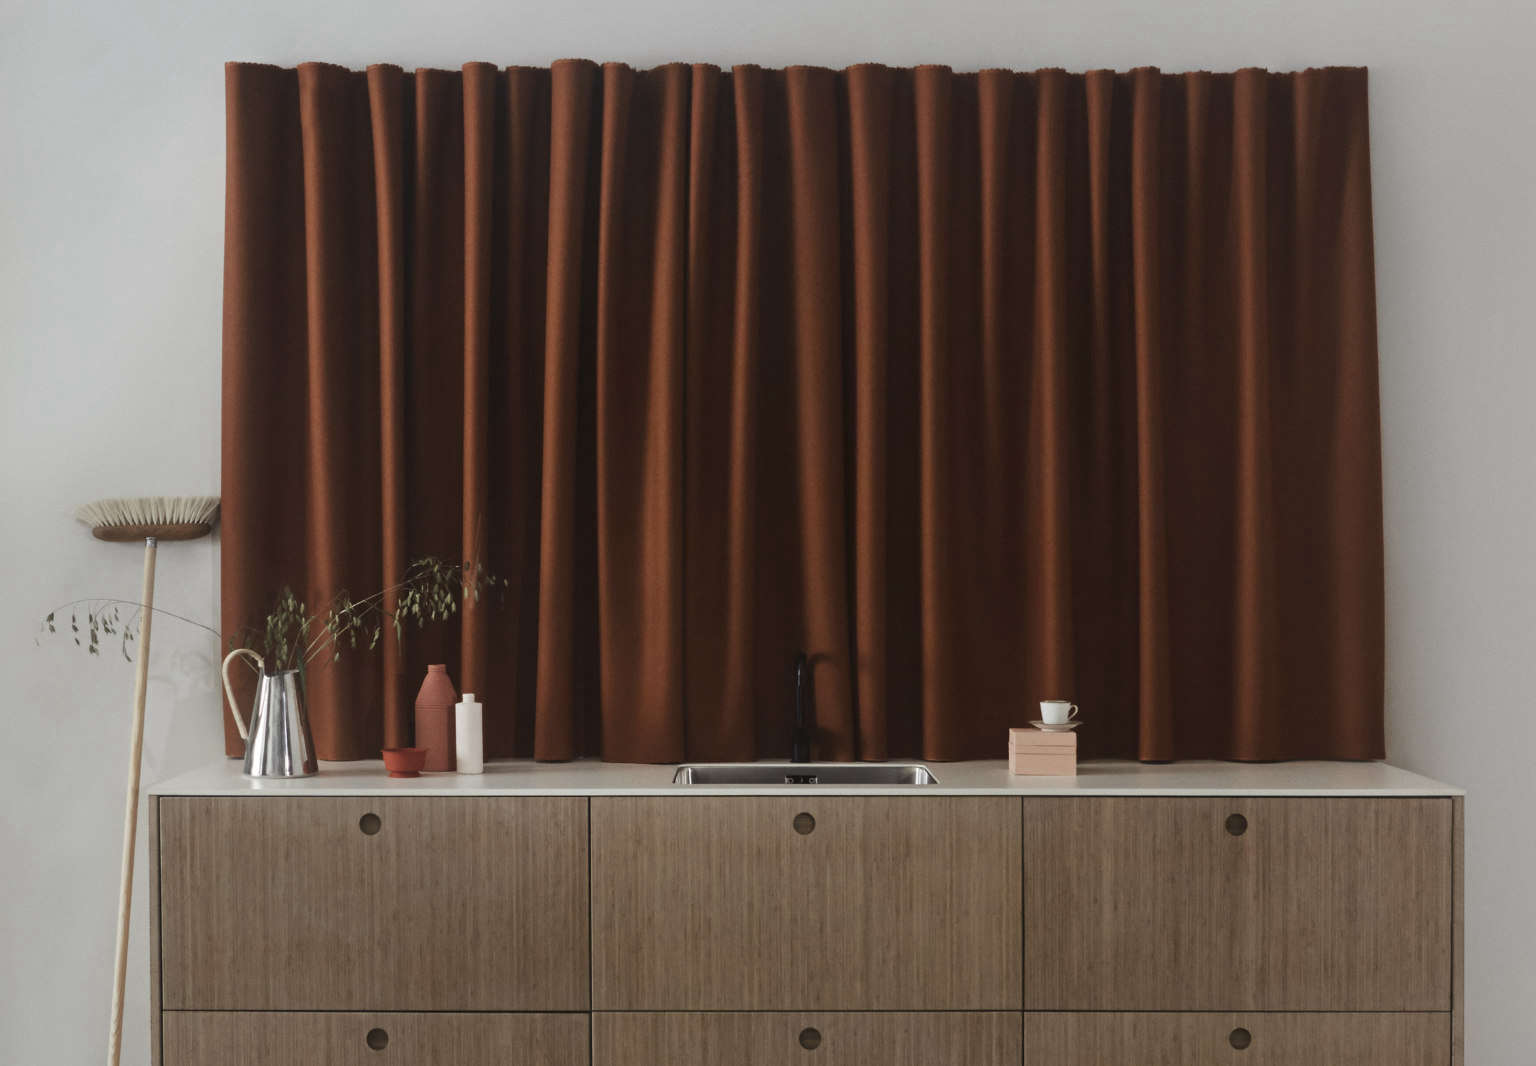 ask og eng design ikea kitchen cabinet fronts stone finish 1536x1066